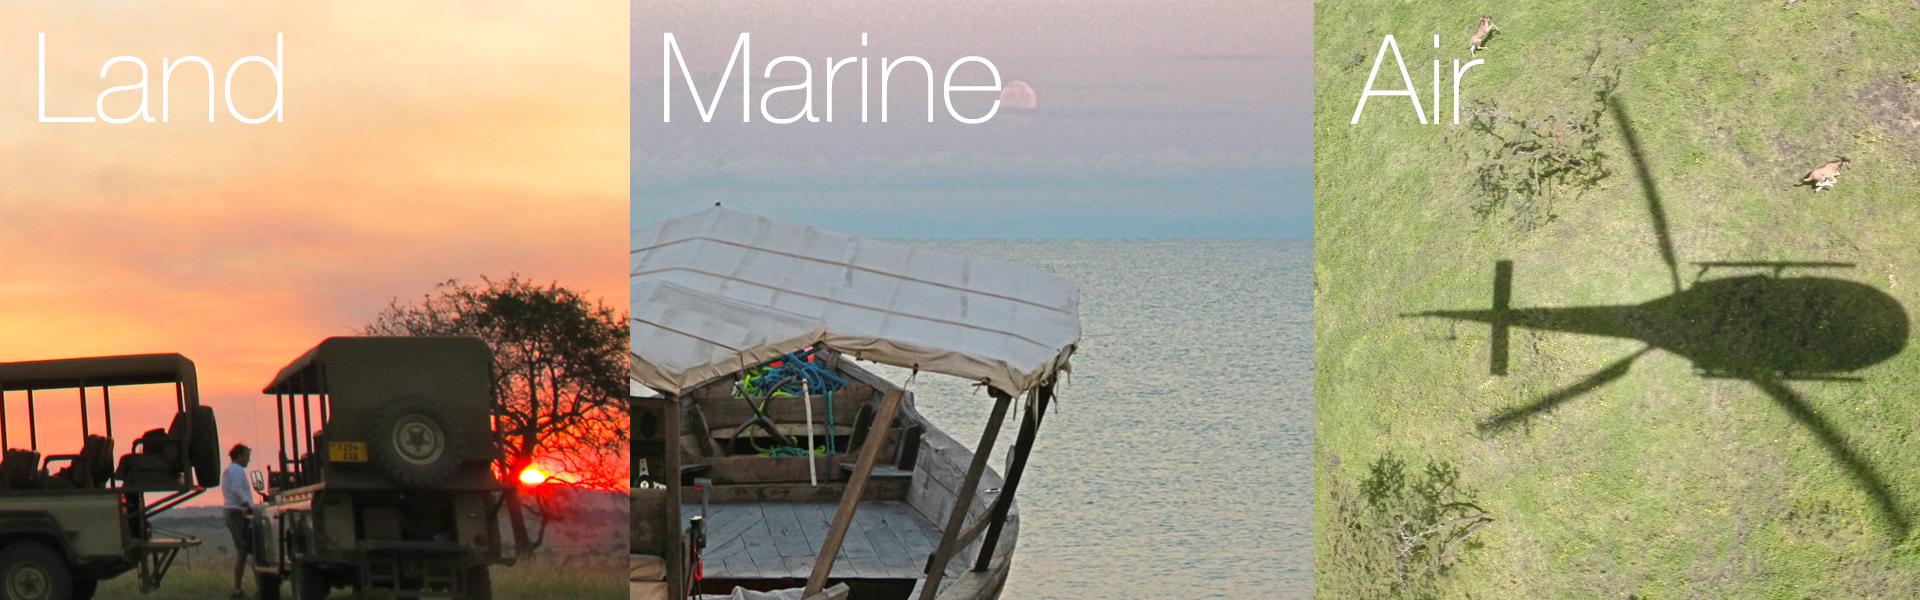 land-marine-air-satellite-communications-northernaxcess2.jpg